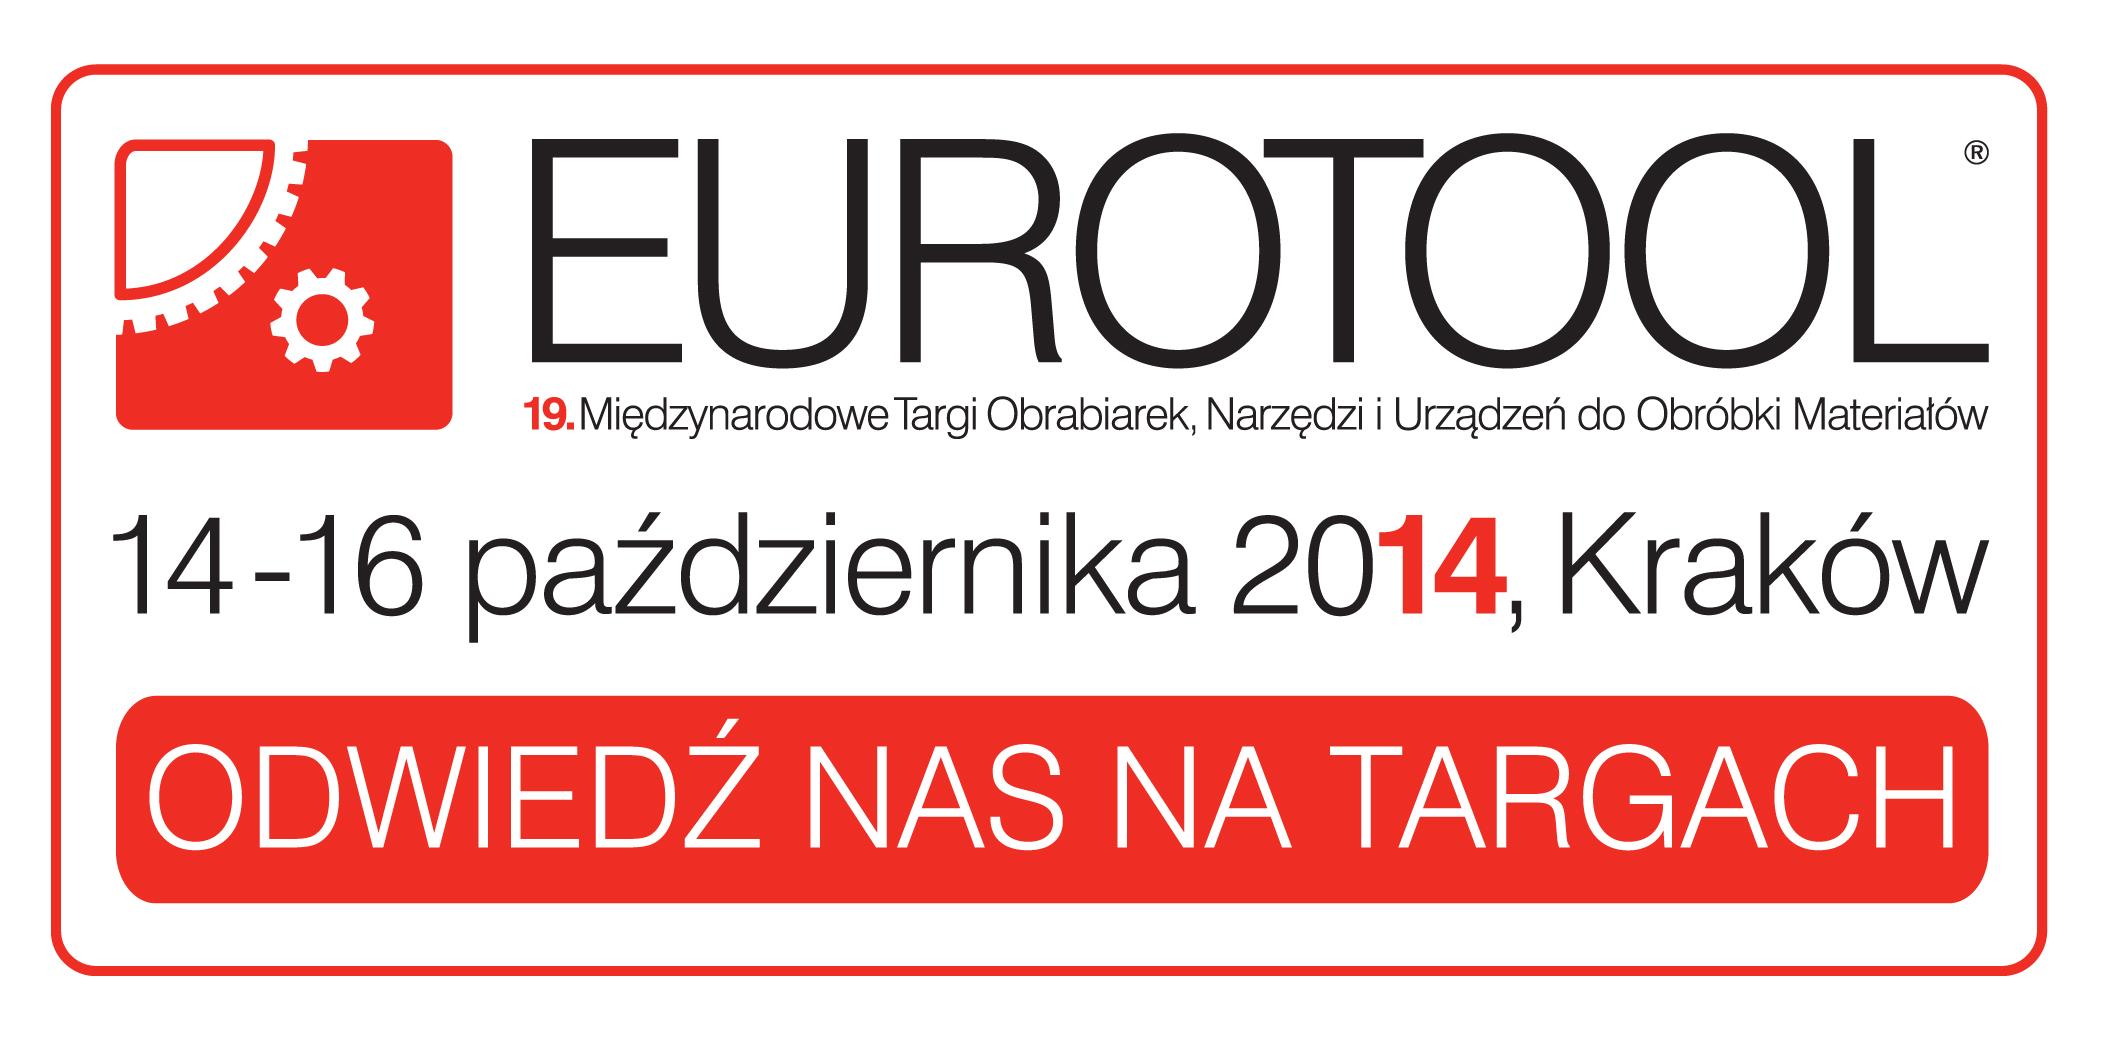 Targi EUROTOOL® 2014 w Krakowie